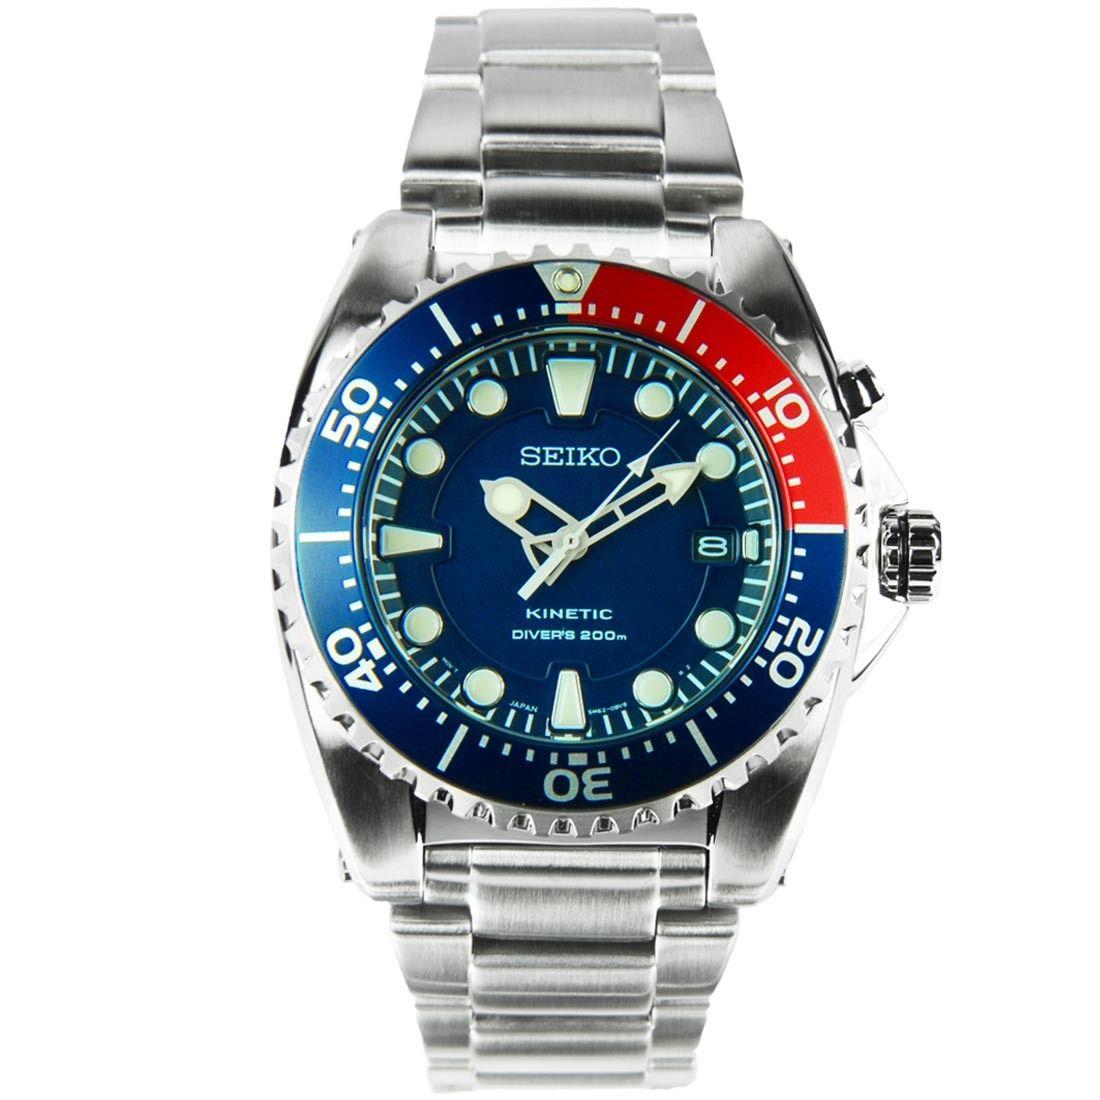 Seiko Kinetic Divers 200m Watch SKA369 SKA369P1 SKA369P ...